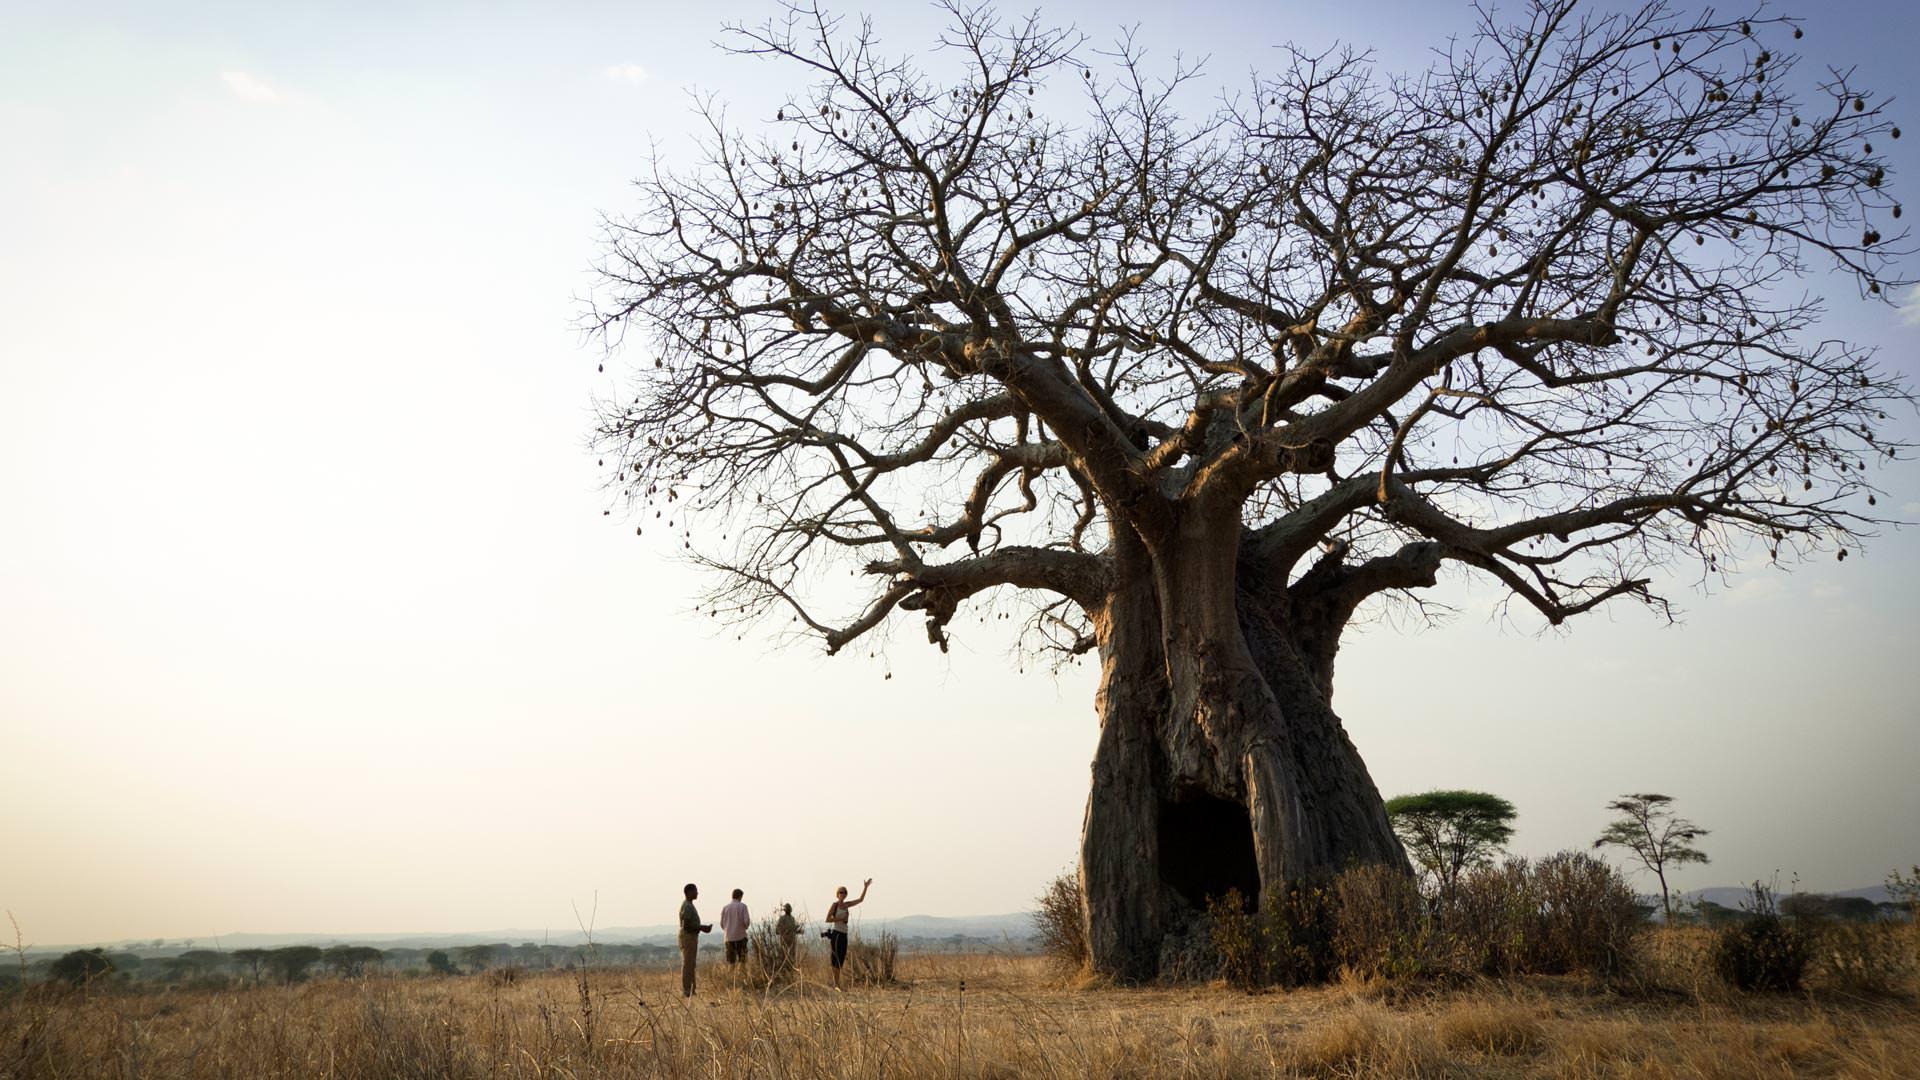 Admiring a baobab tree